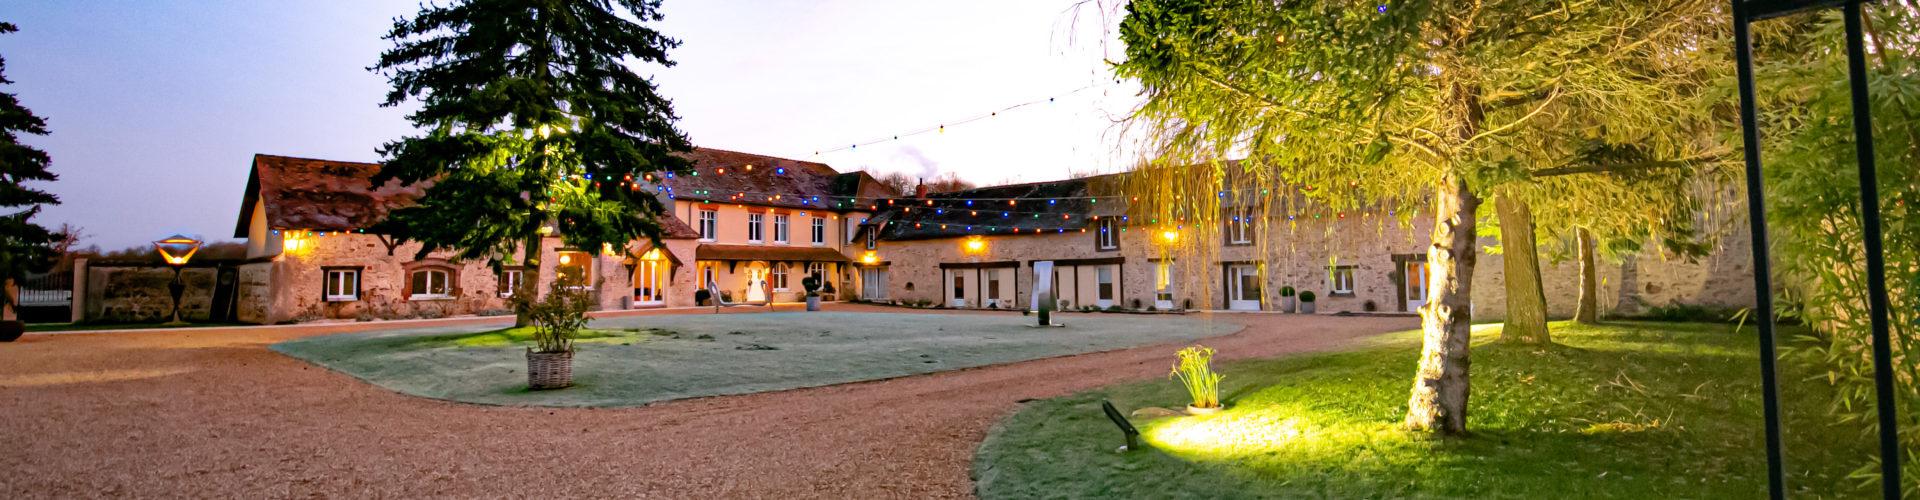 Lieu de séminaire atypique Normandie